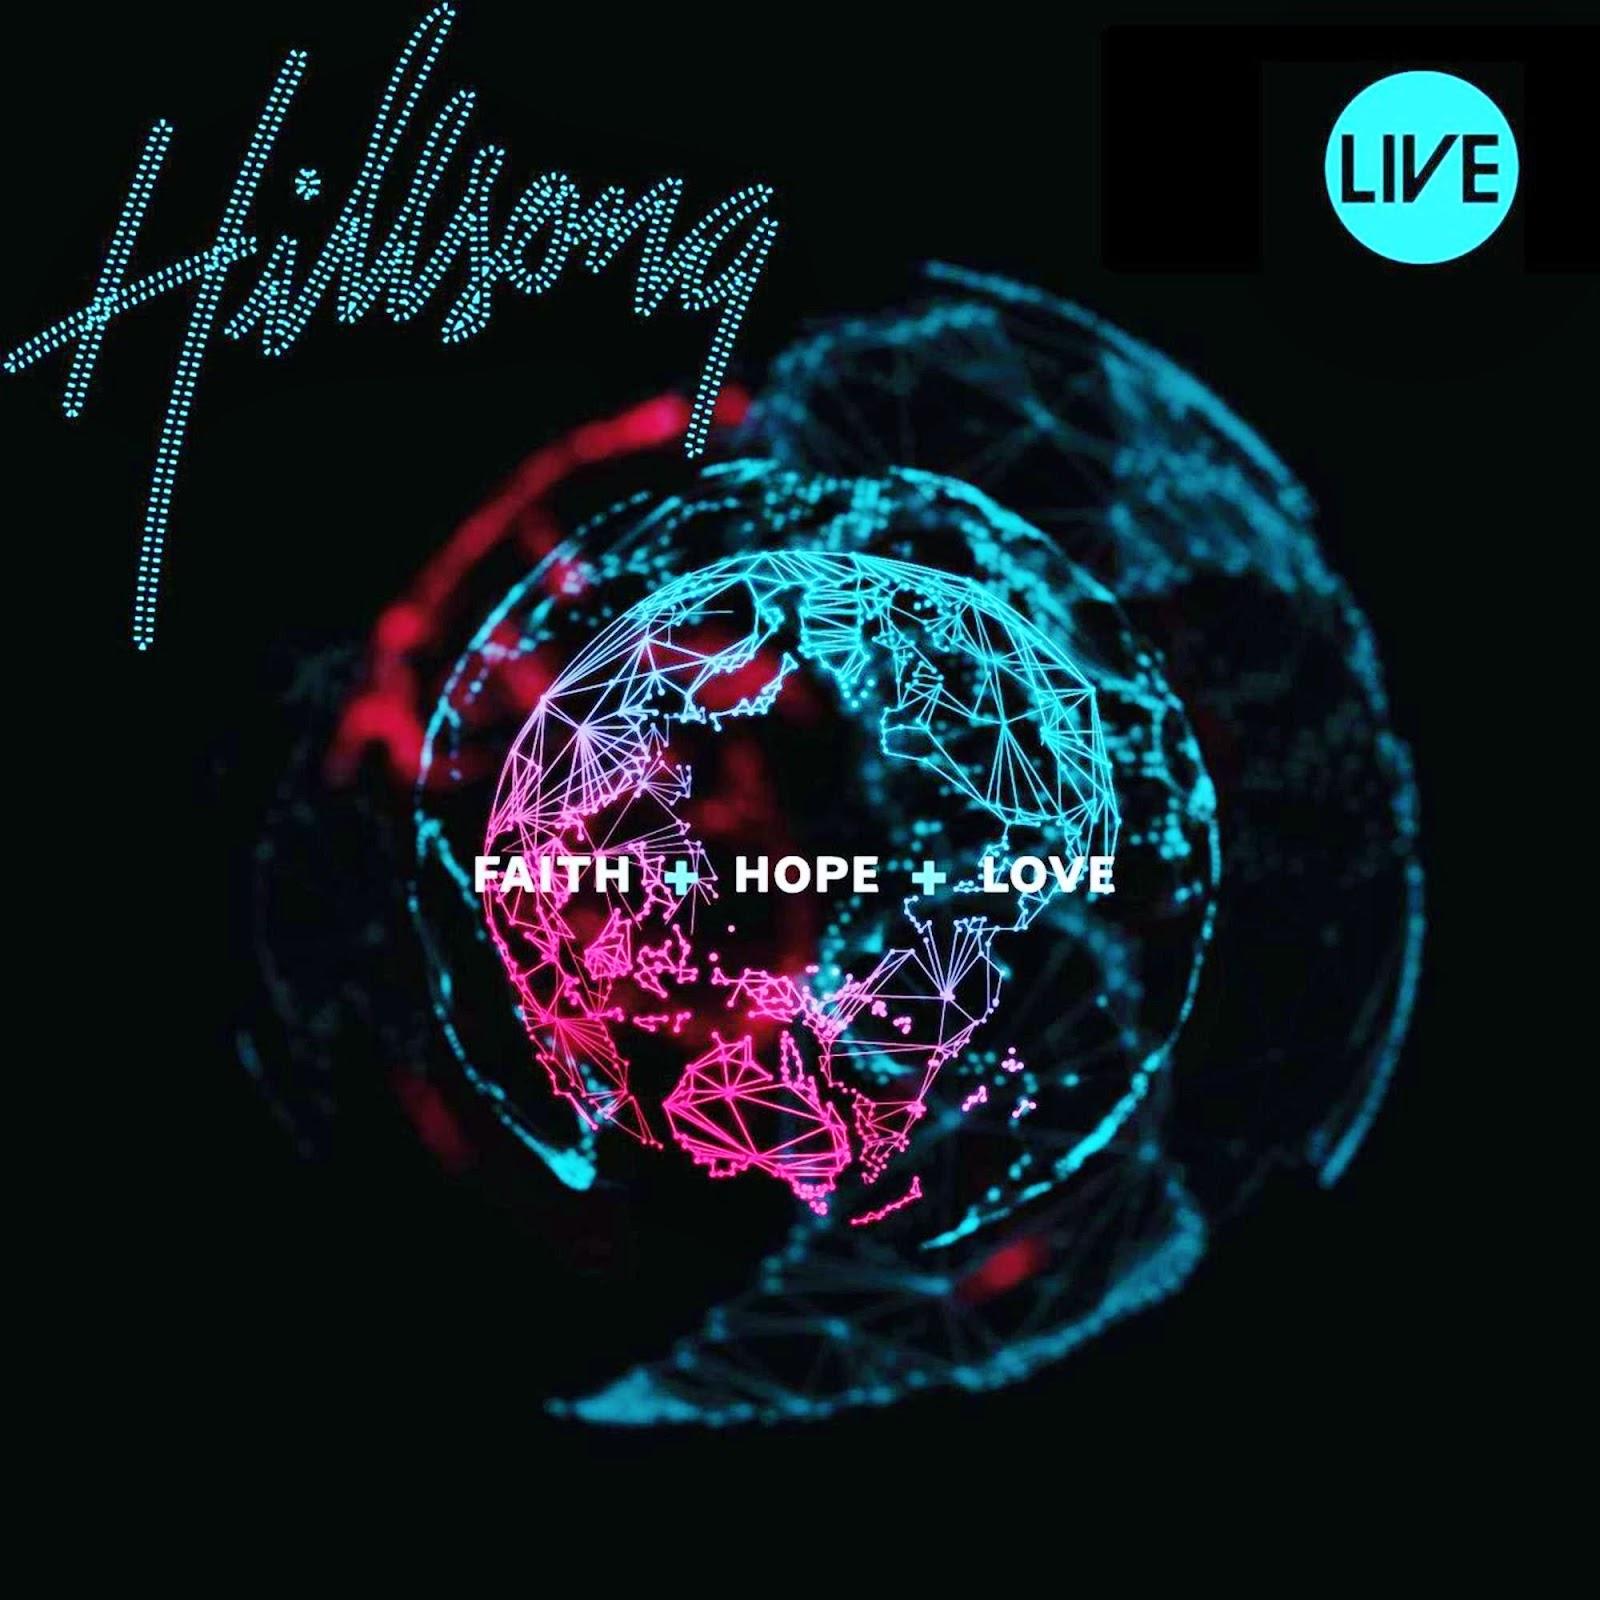 Hillsong Worship - I Will Exalt You (Audio Download